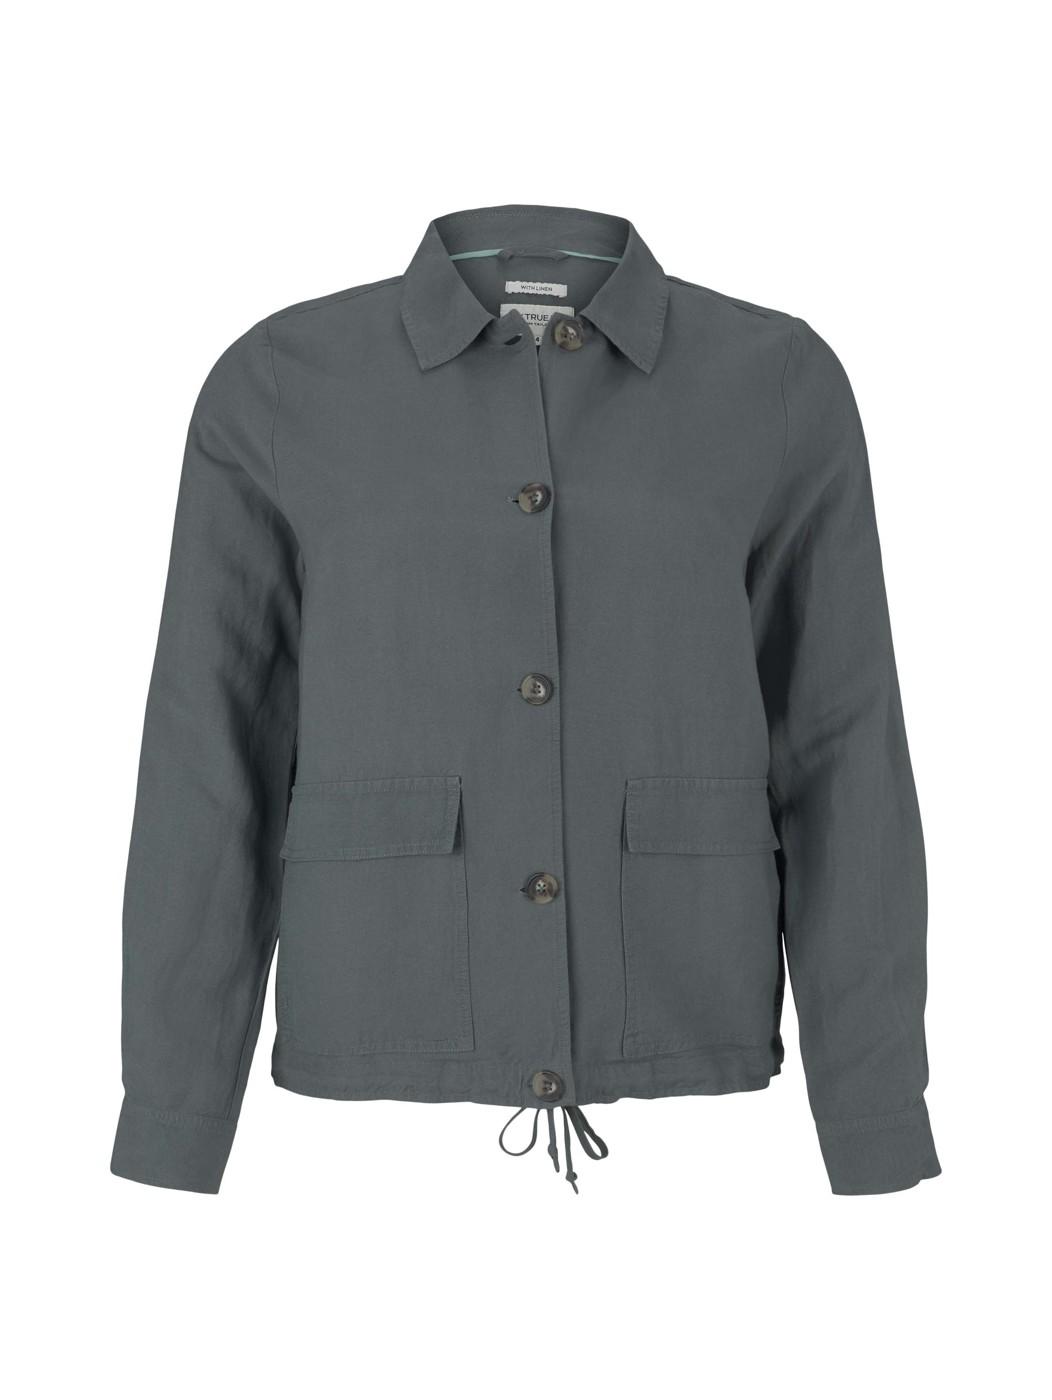 TOM TAILOR  blazer jacket with pockets - Damen